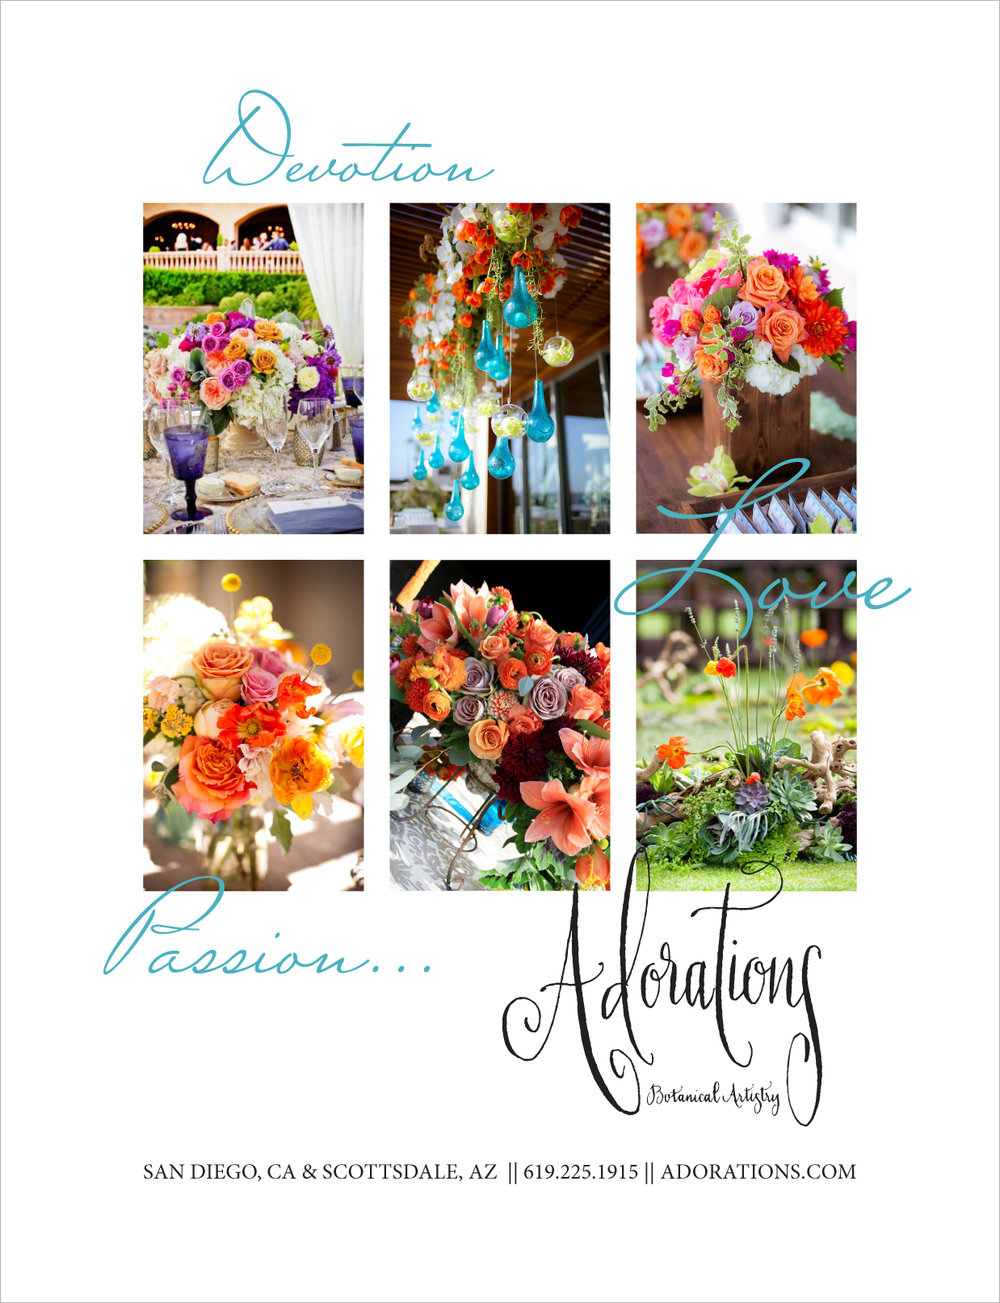 Adorations7.jpg